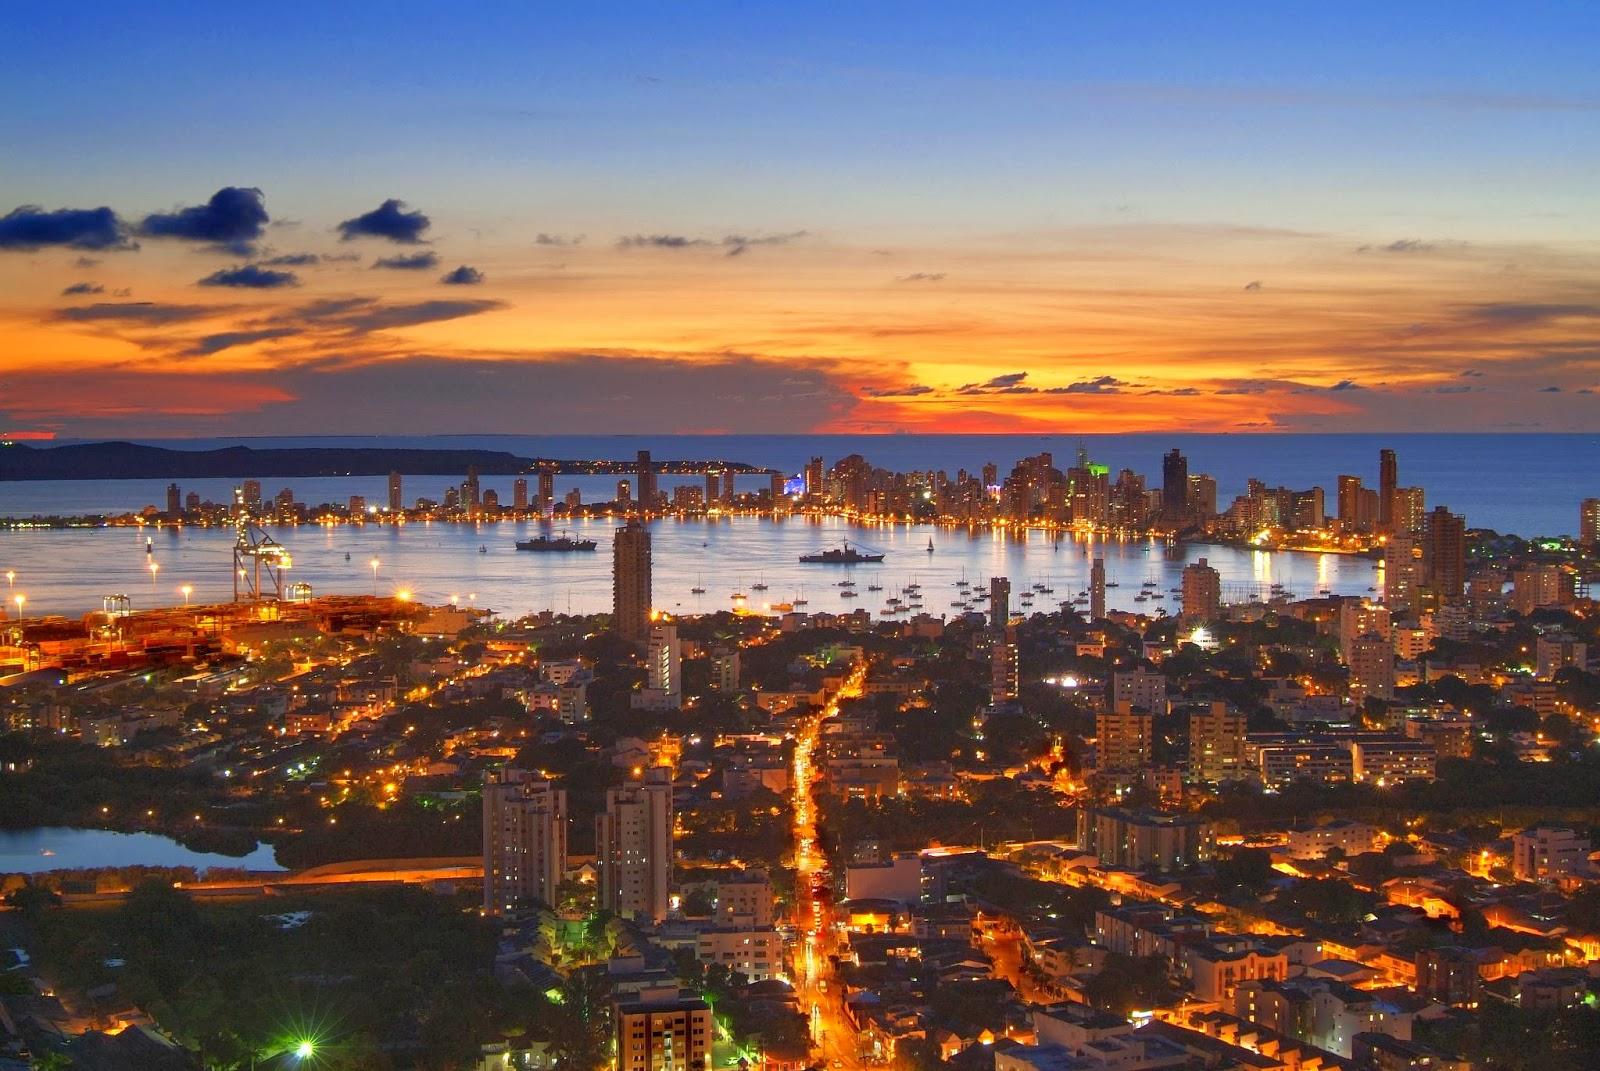 Hoteles-Economicos-Cartagena